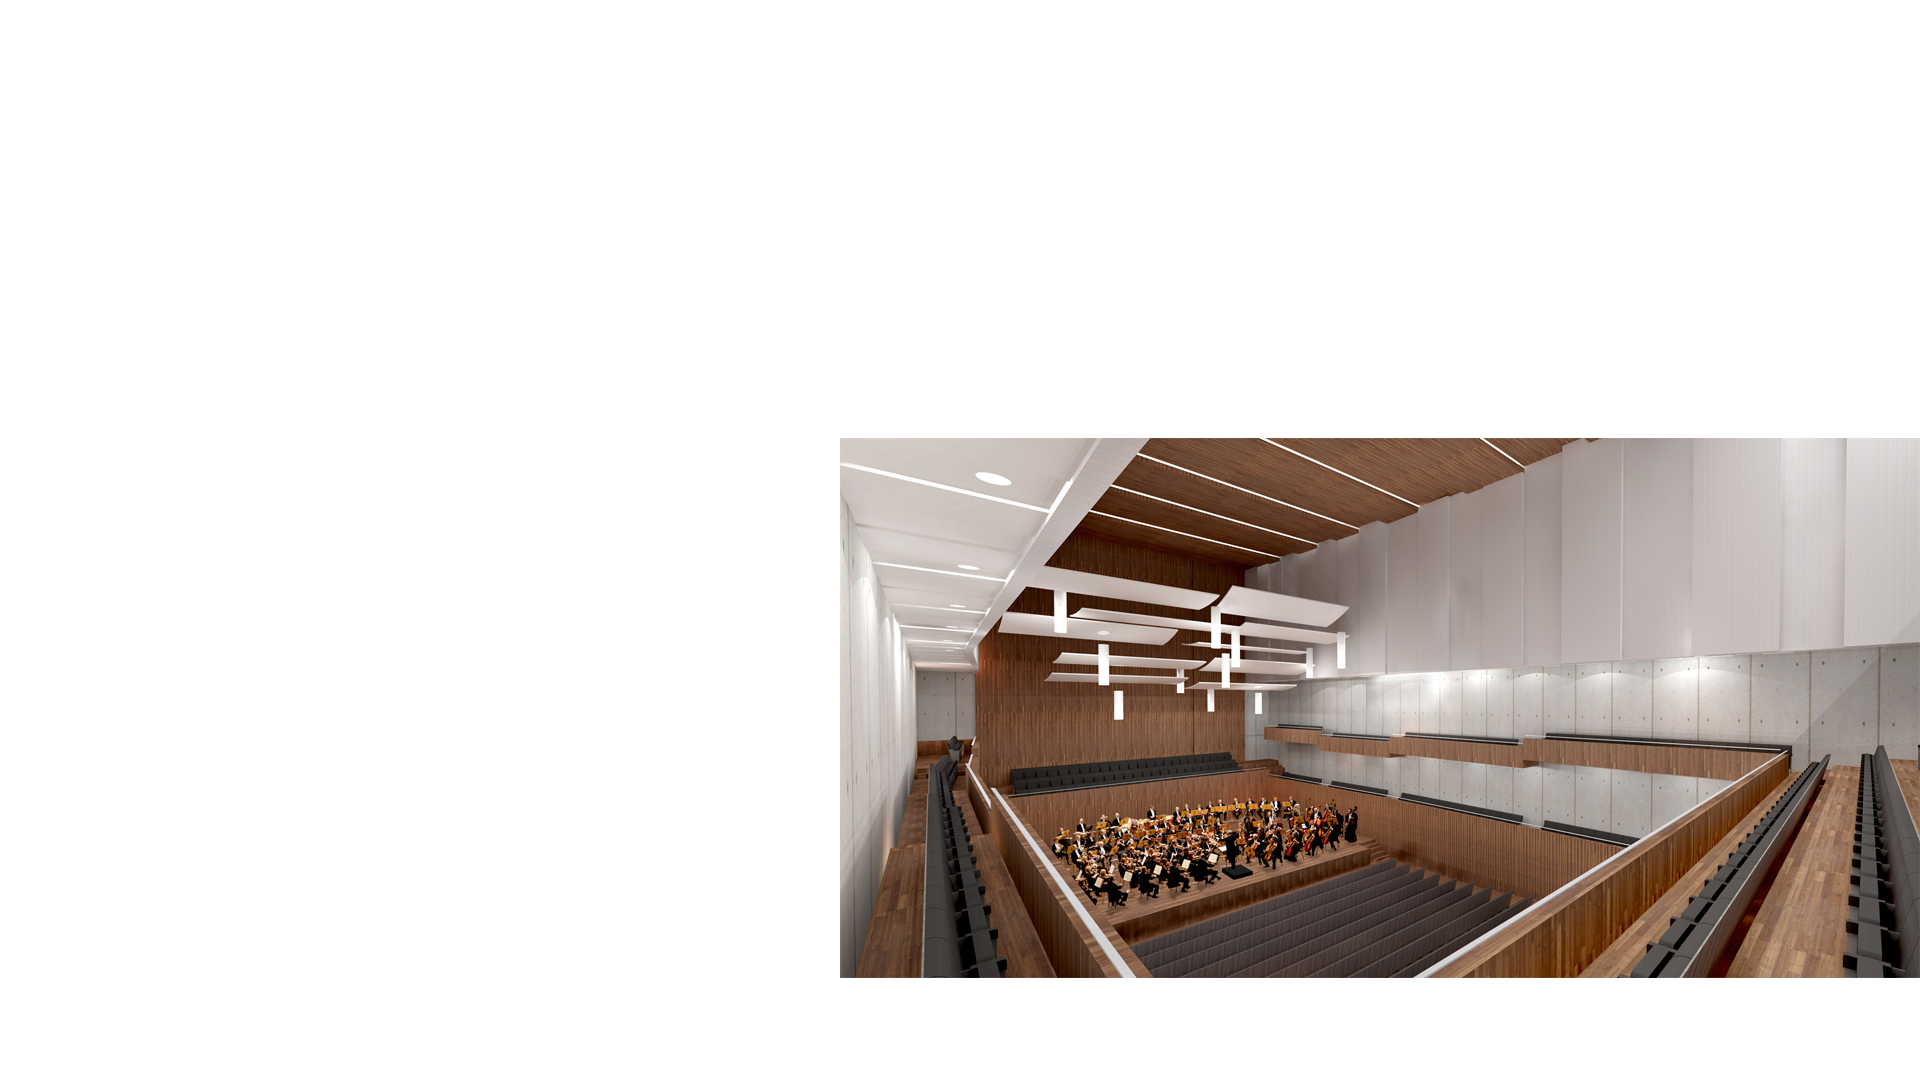 Musikzentrum Bochum rendered interior view of the main concert hall.